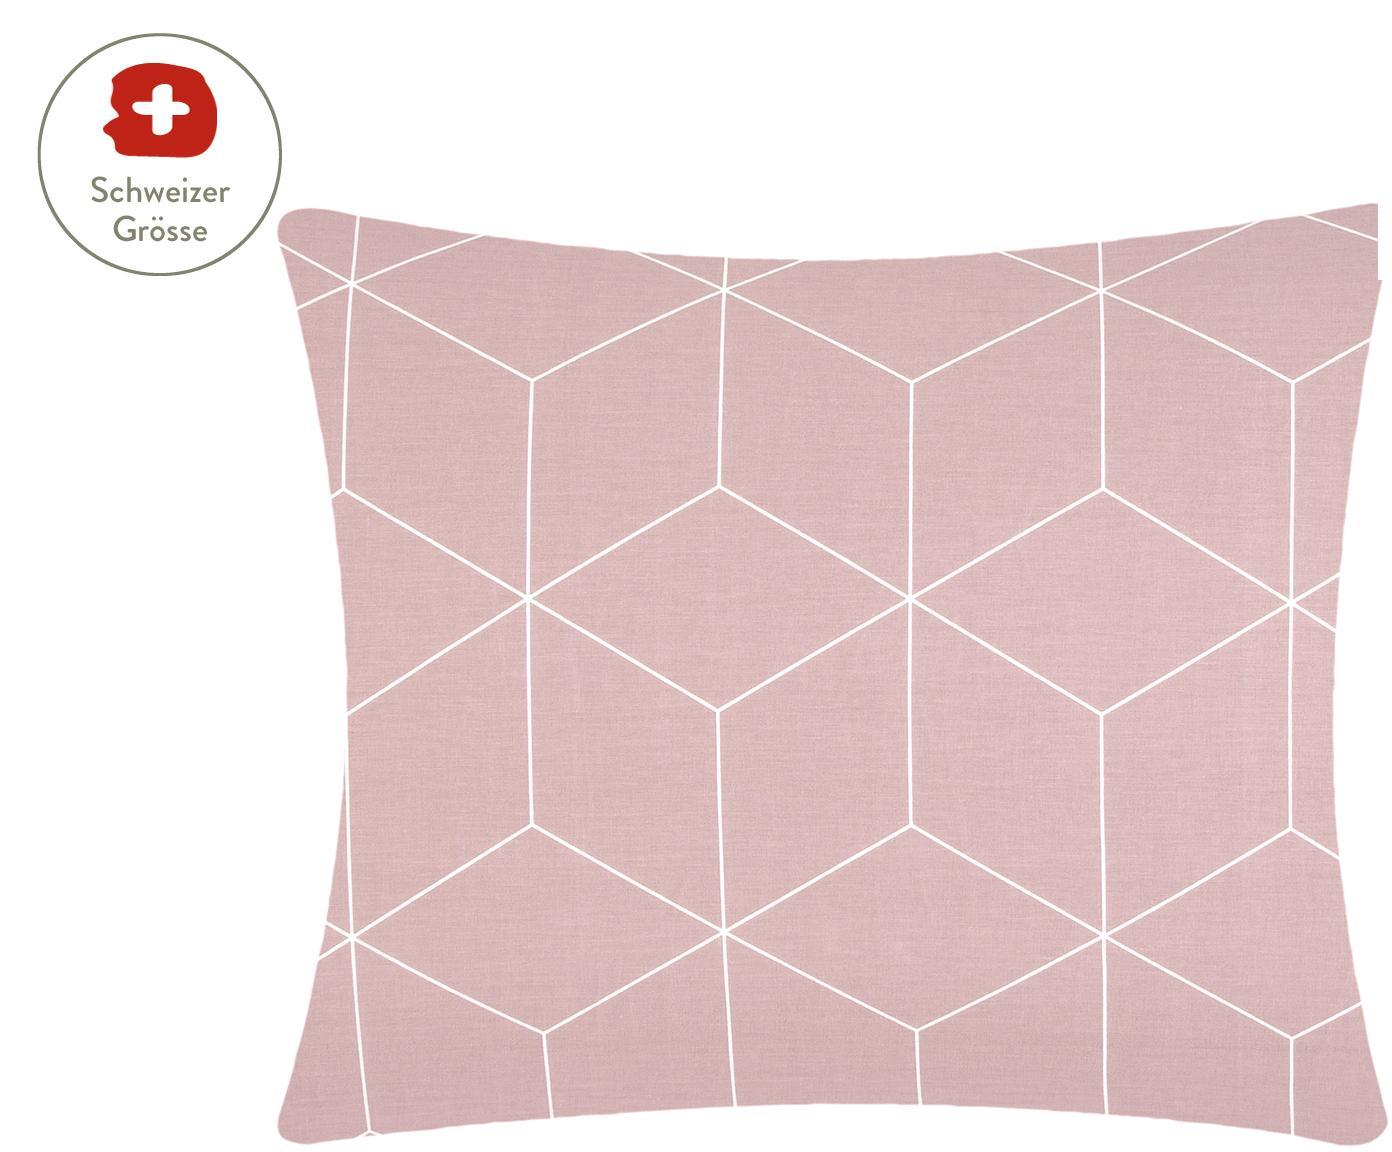 Baumwoll-Kissenbezug Lynn mit grafischem Muster, Webart: Renforcé Fadendichte 144 , Altrosa, Cremeweiss, 65 x 65 cm